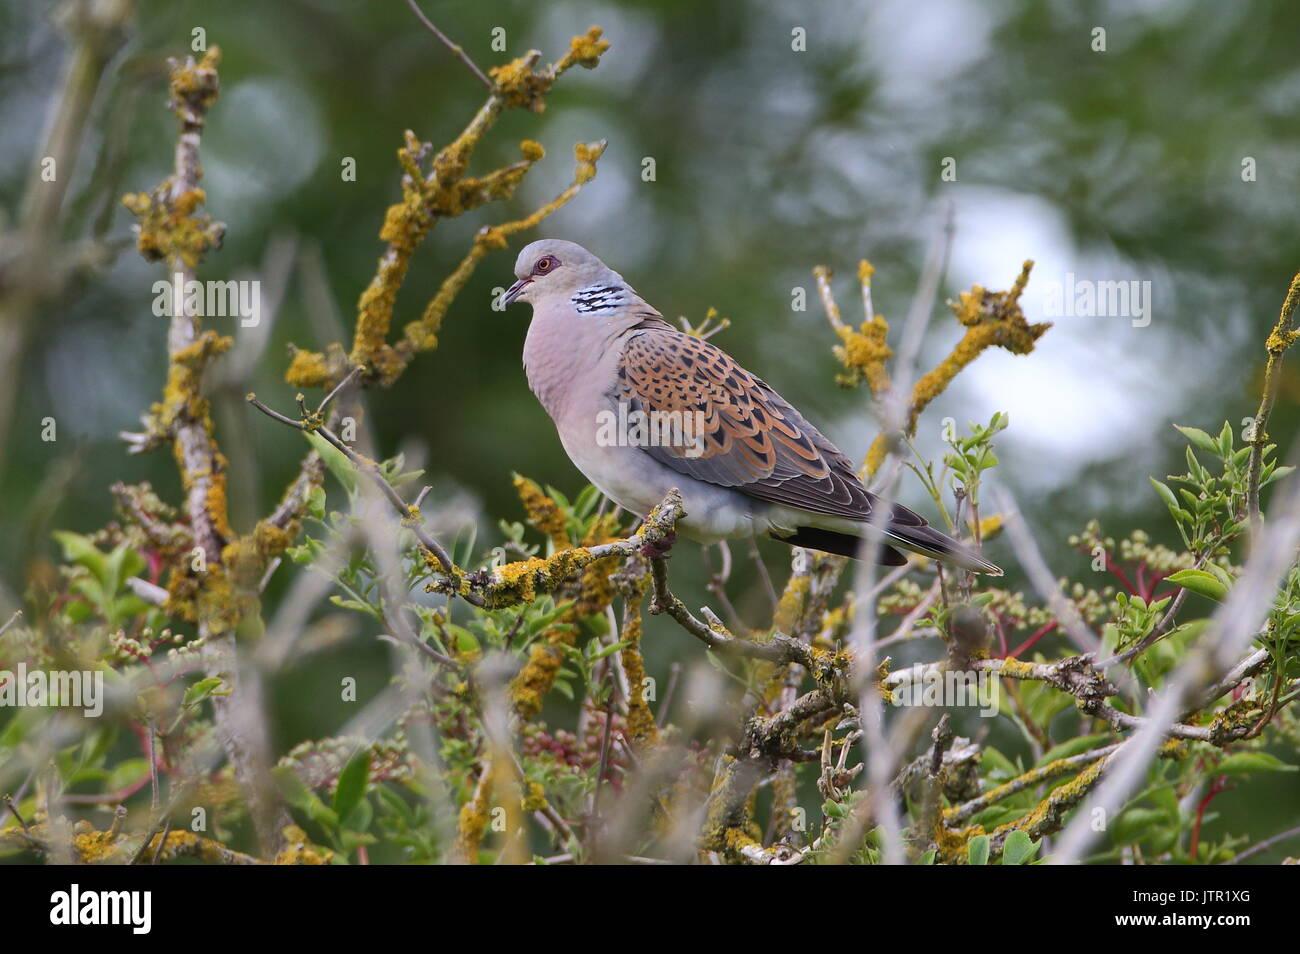 Adult Turtle Dove - Stock Image